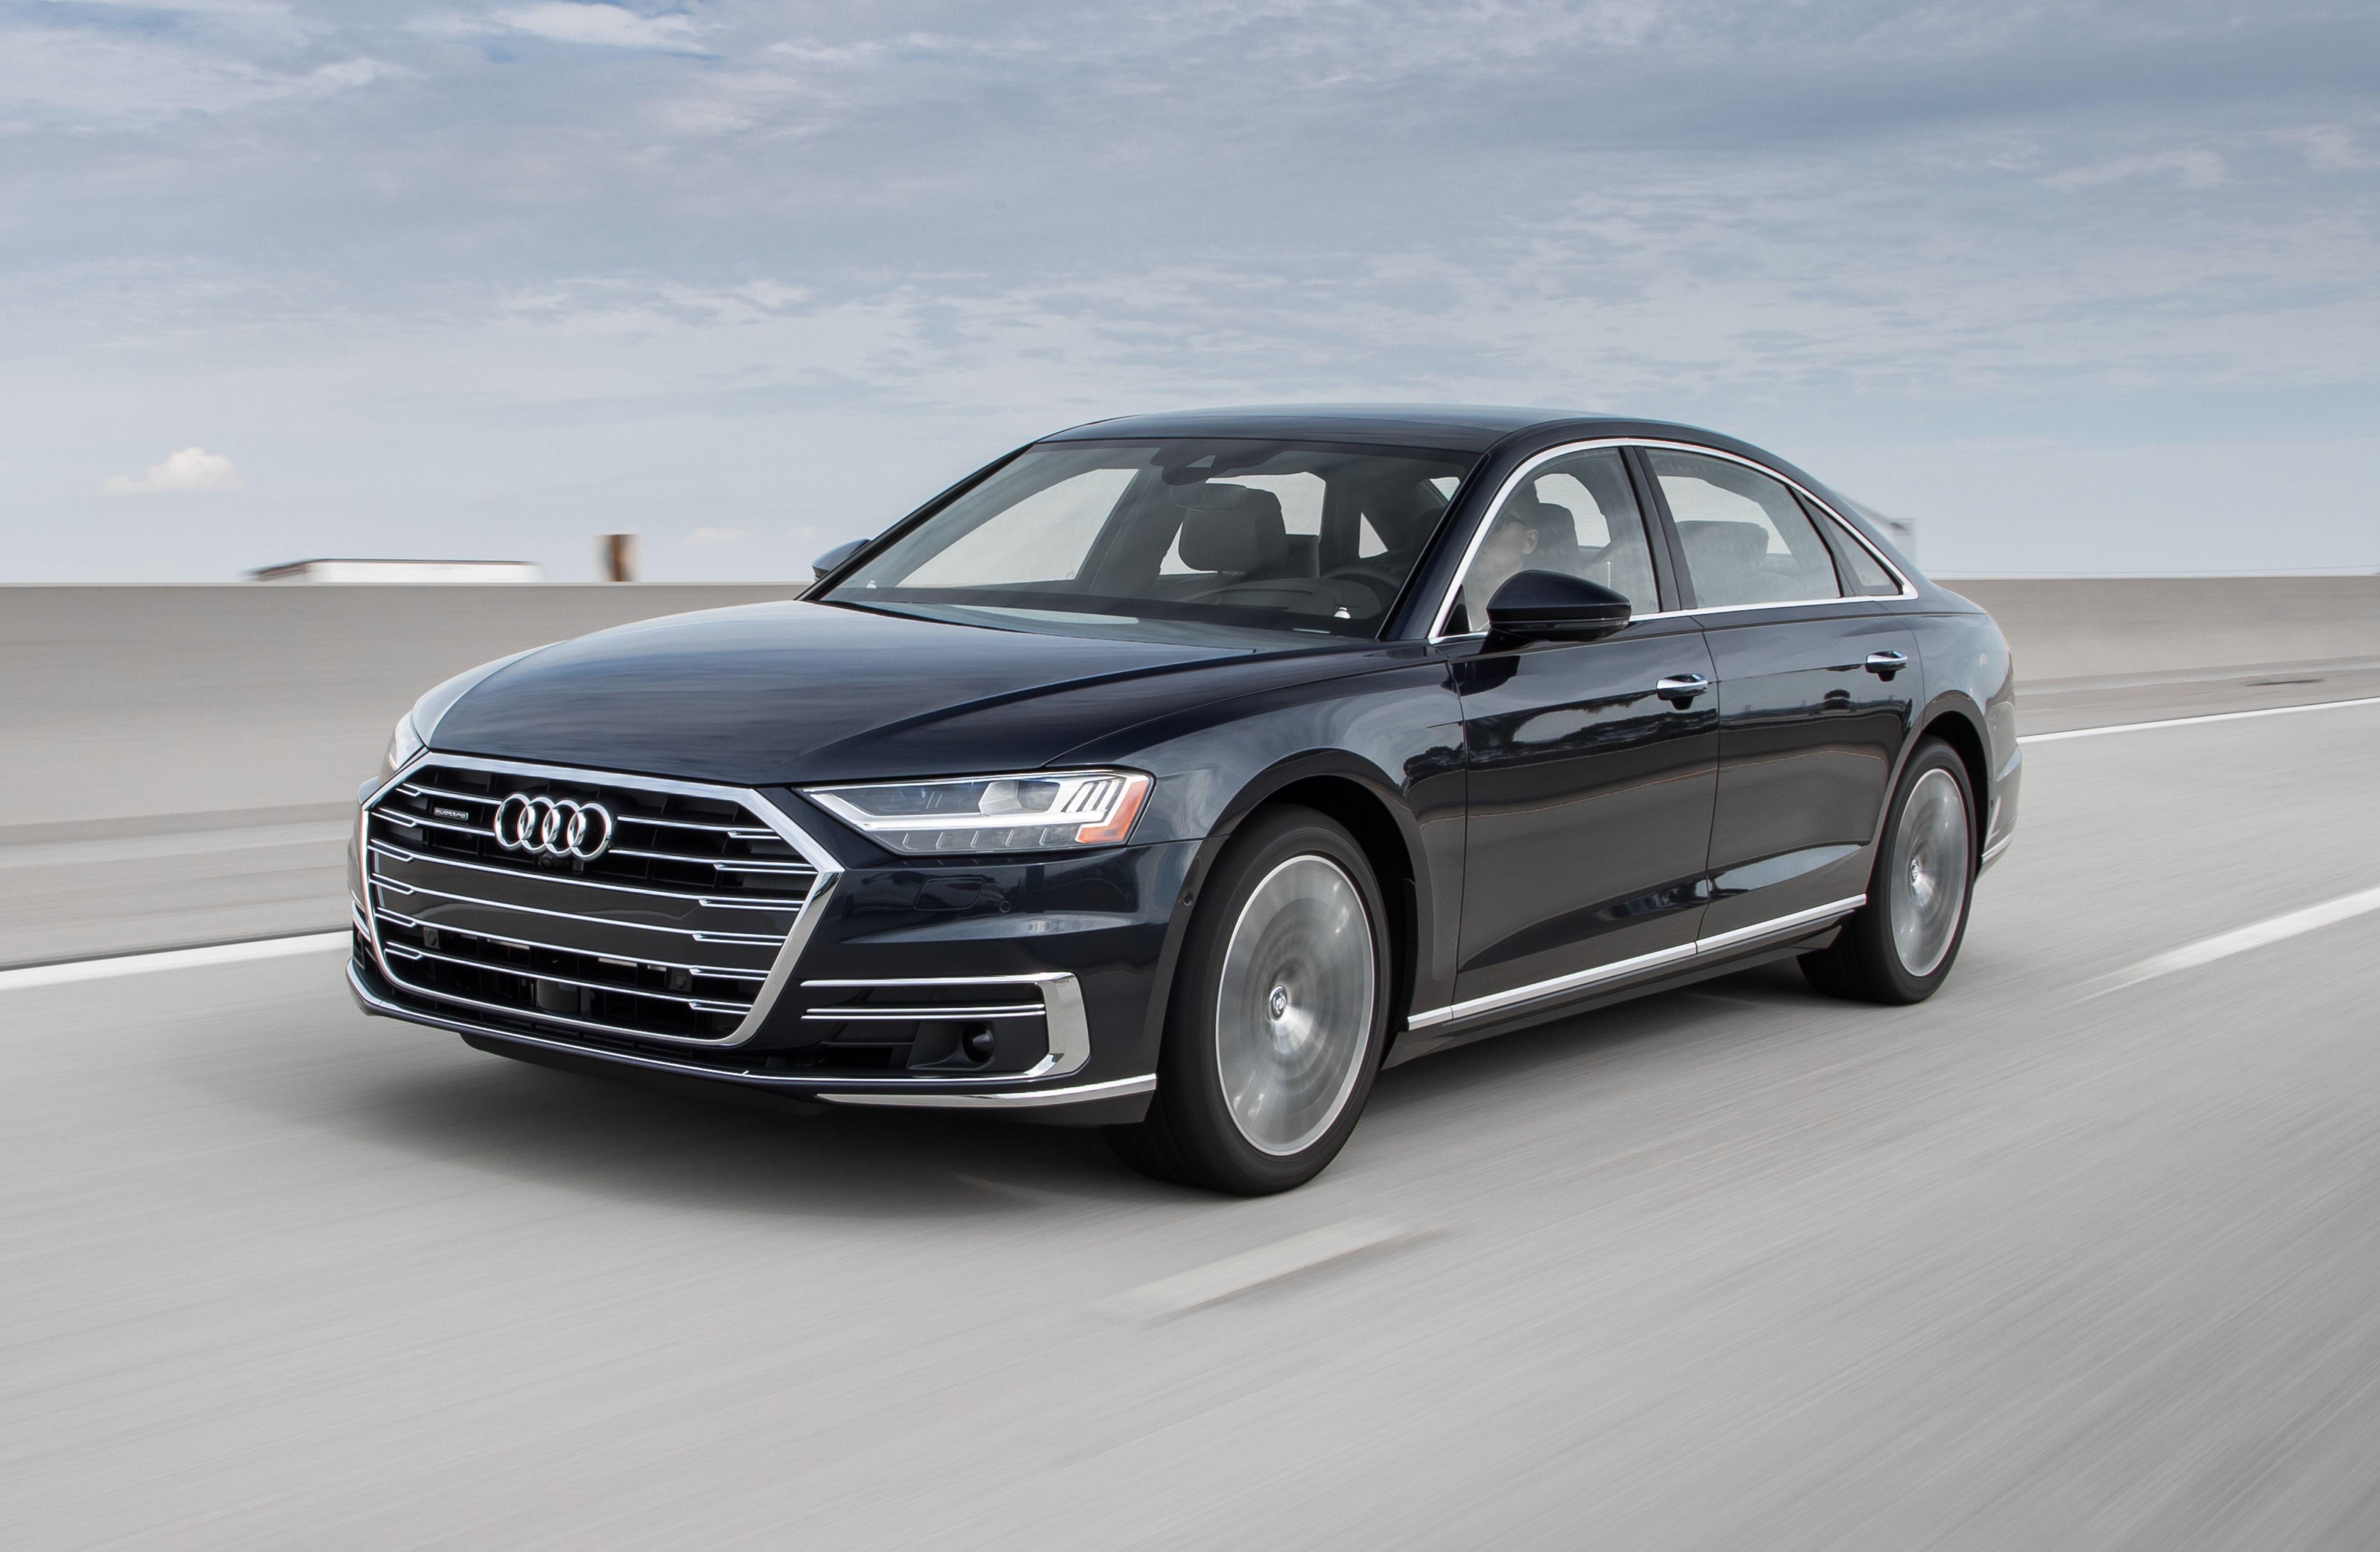 20++ Audi luxury sedan inspiration